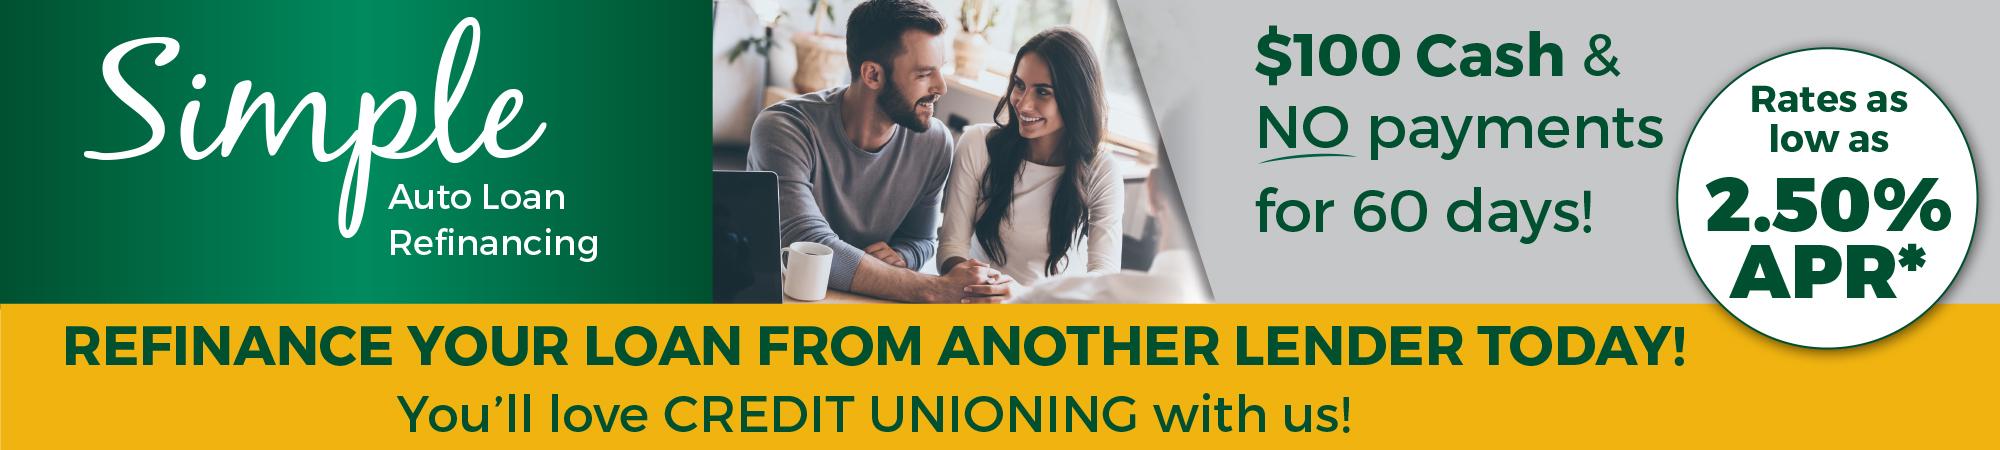 Simple Auto Loan Refinancing